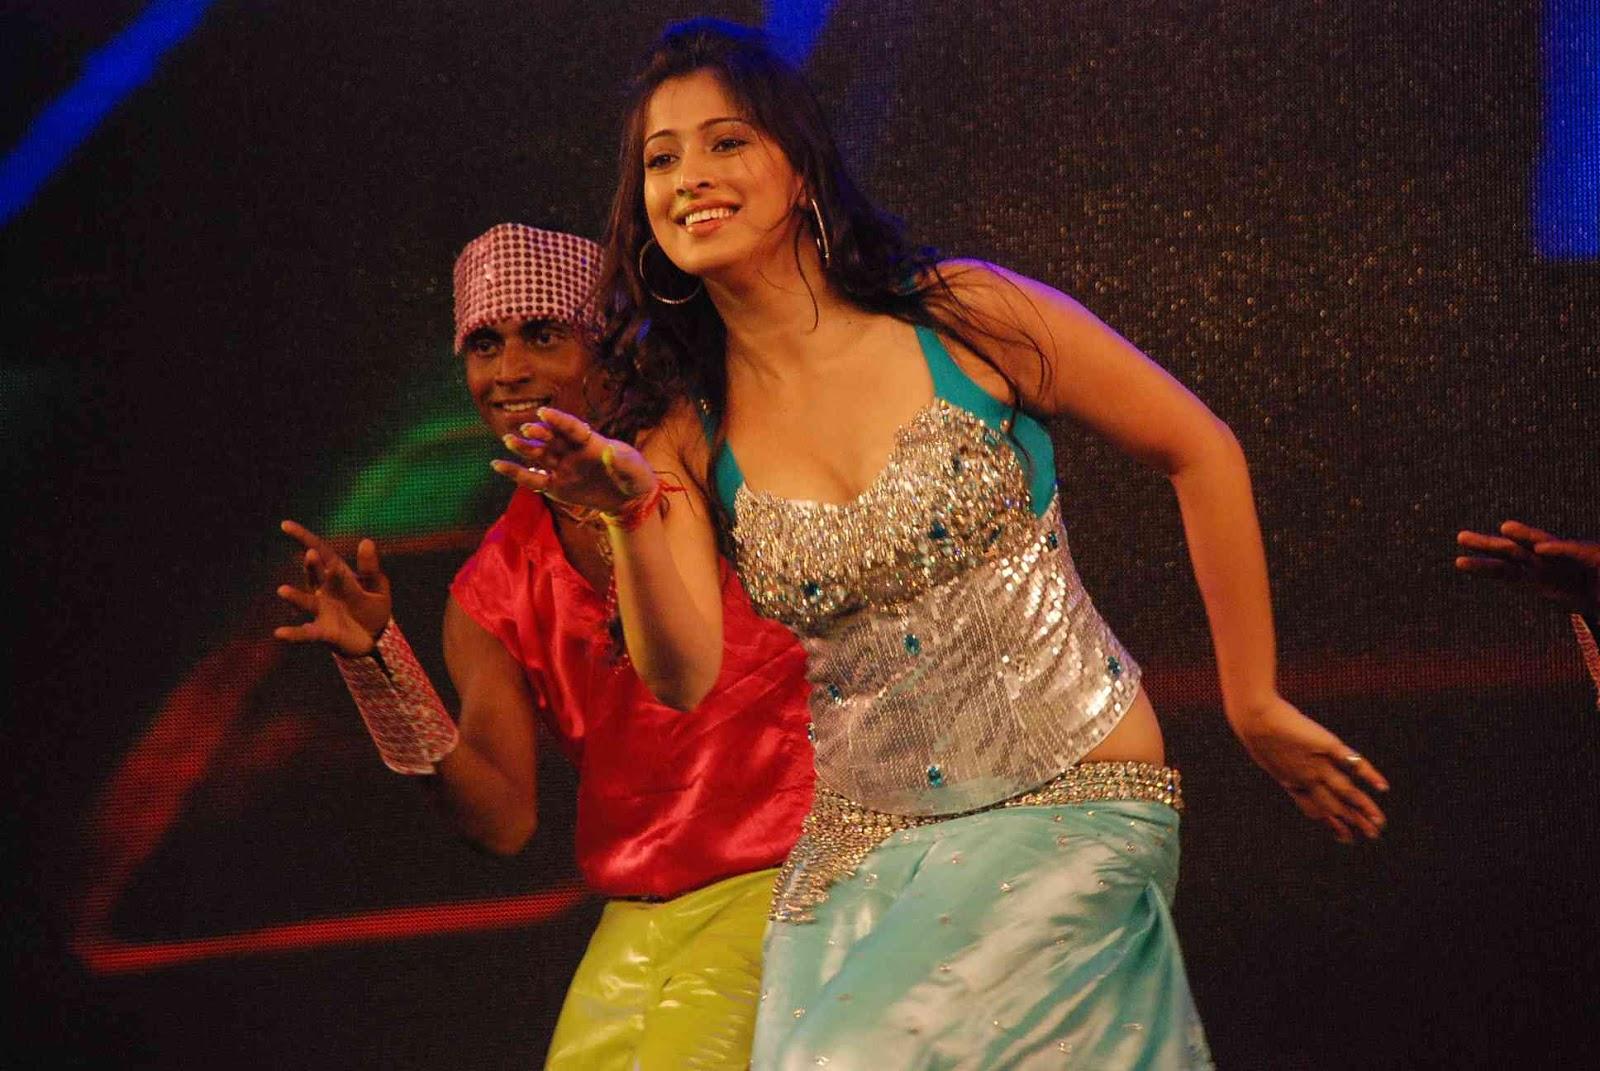 Lakshmi rai dancing on stage